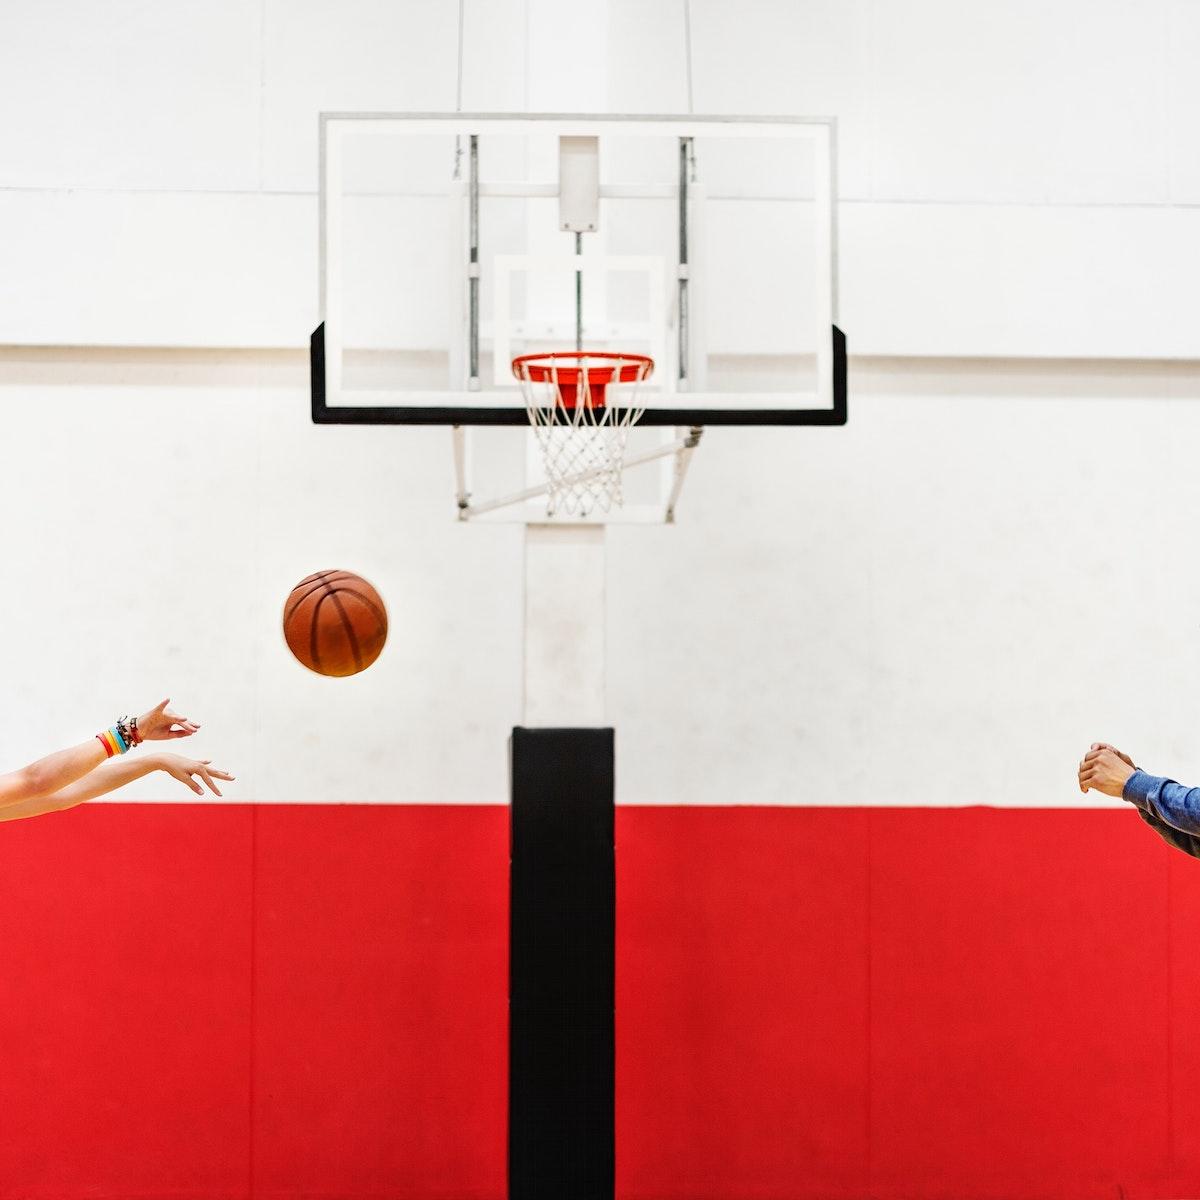 Hands shooting basketball to the net hoop